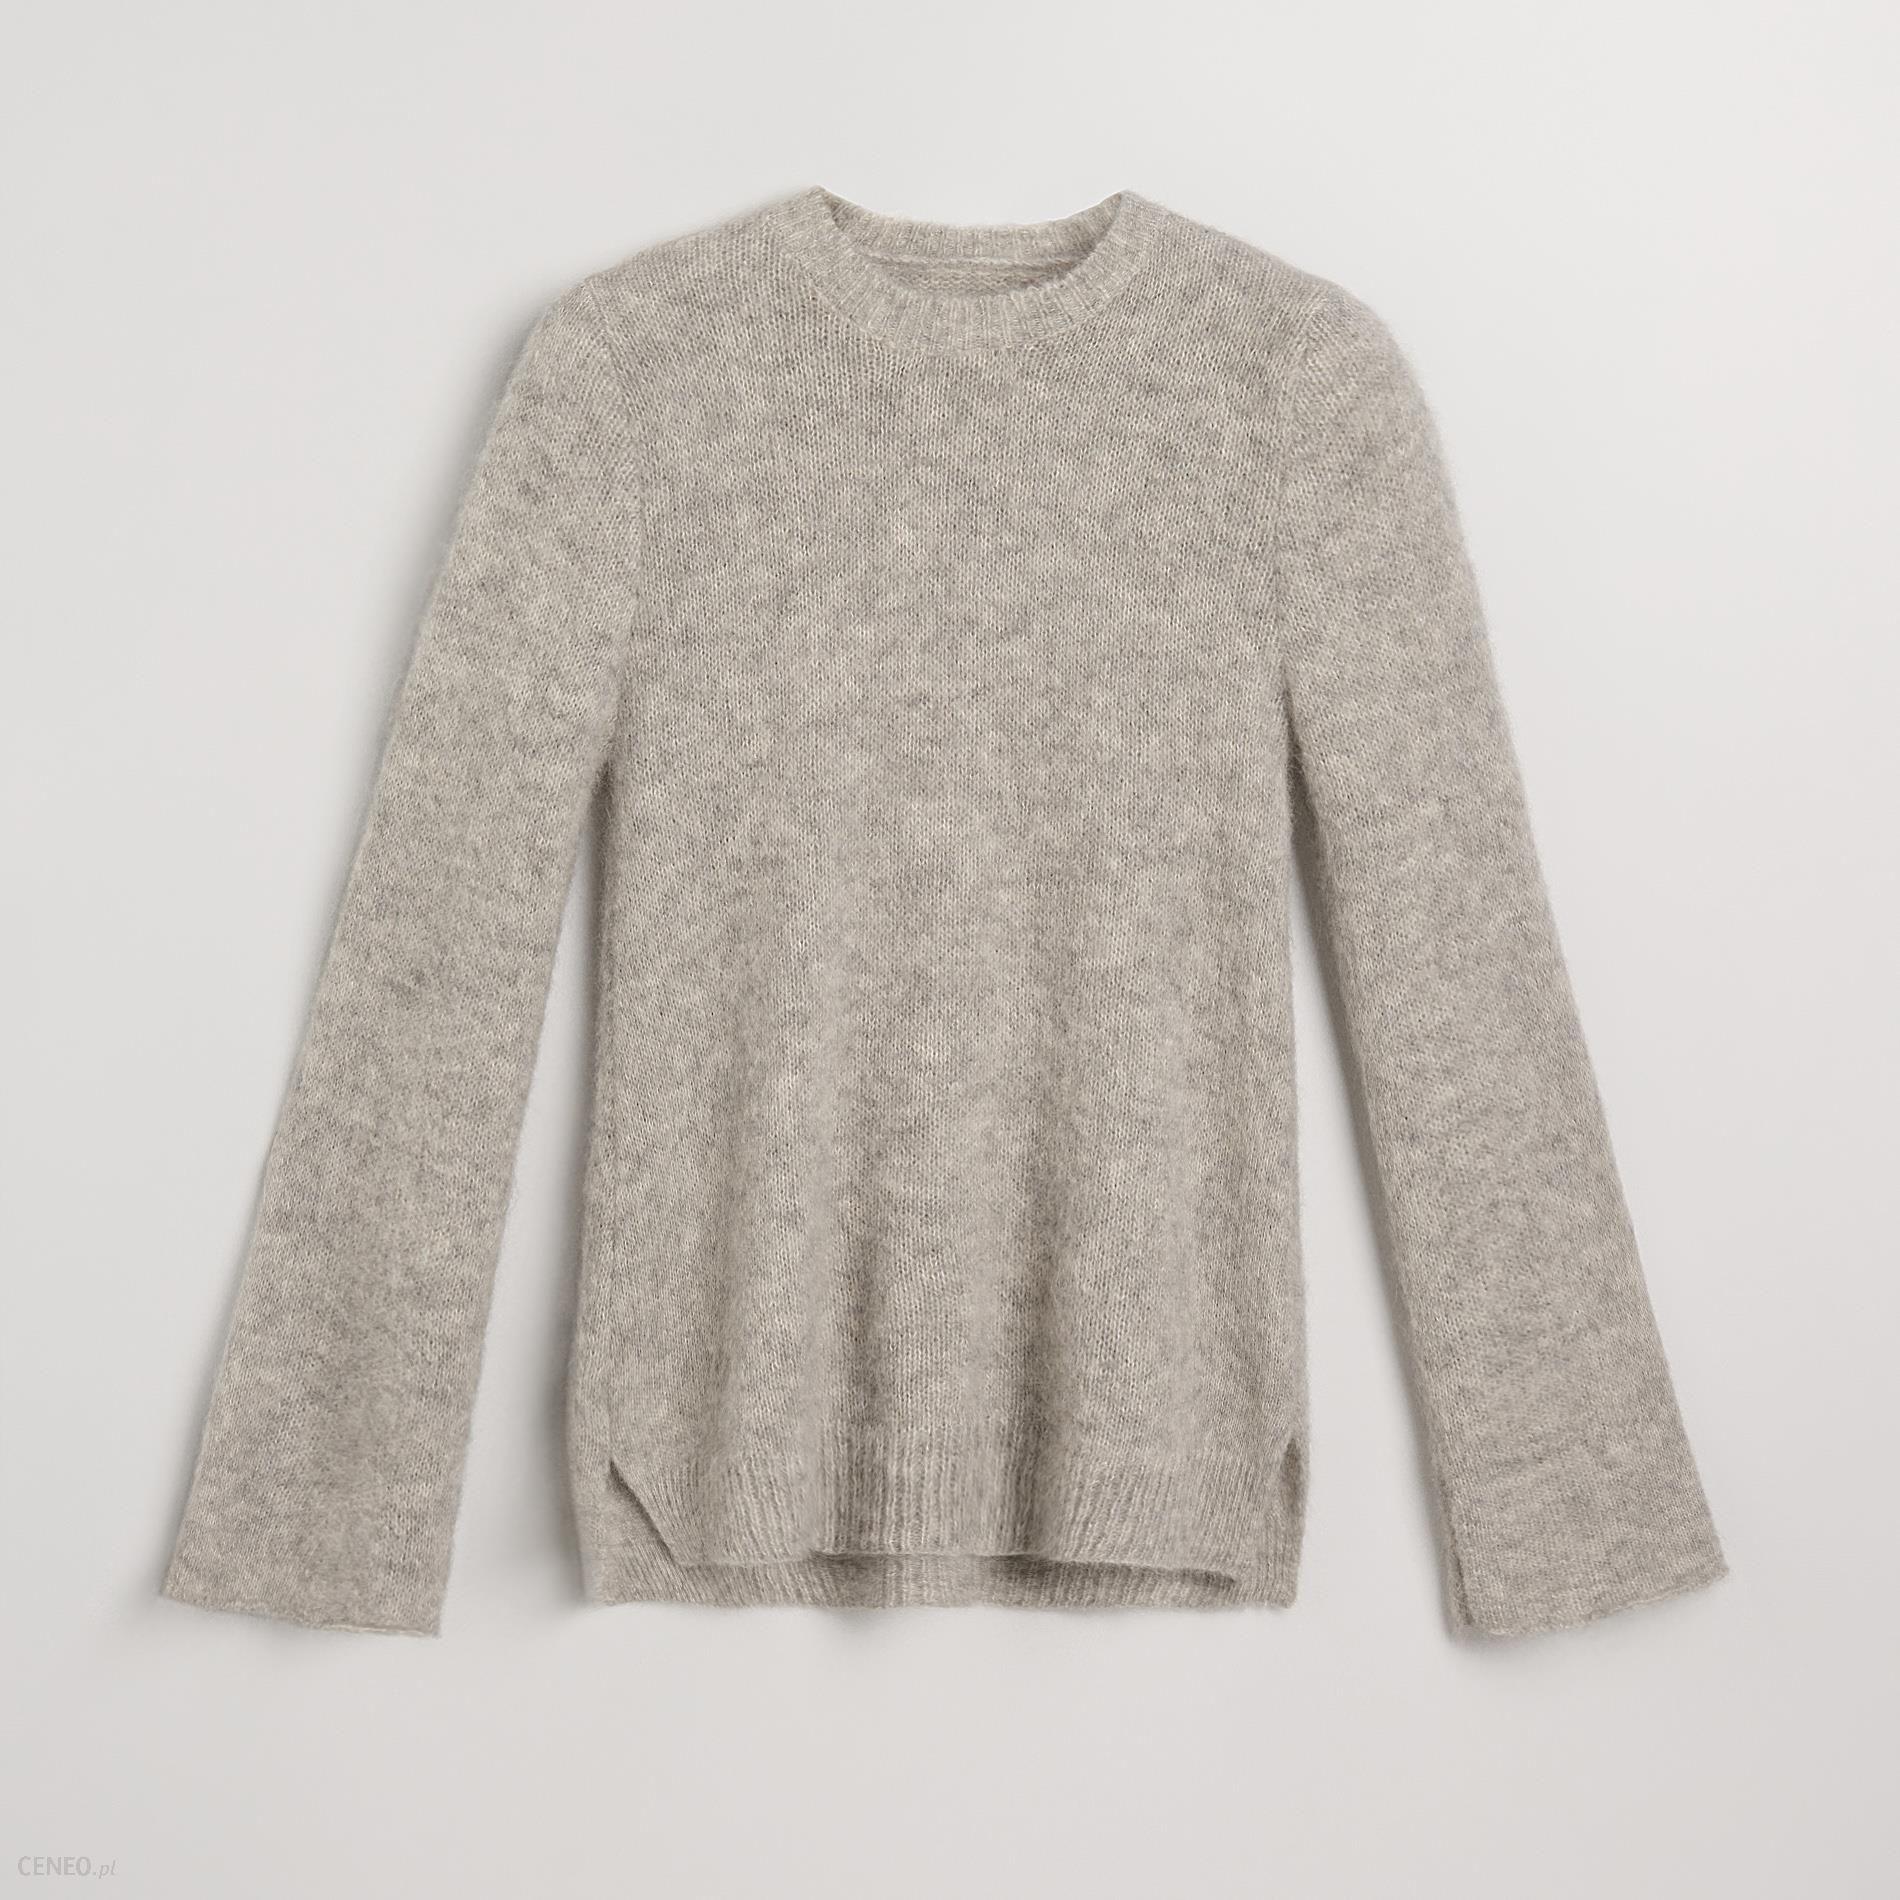 50d1e72e0e94a2 Reserved - Sweter z moherem - Jasny szar - Ceny i opinie - Ceneo.pl